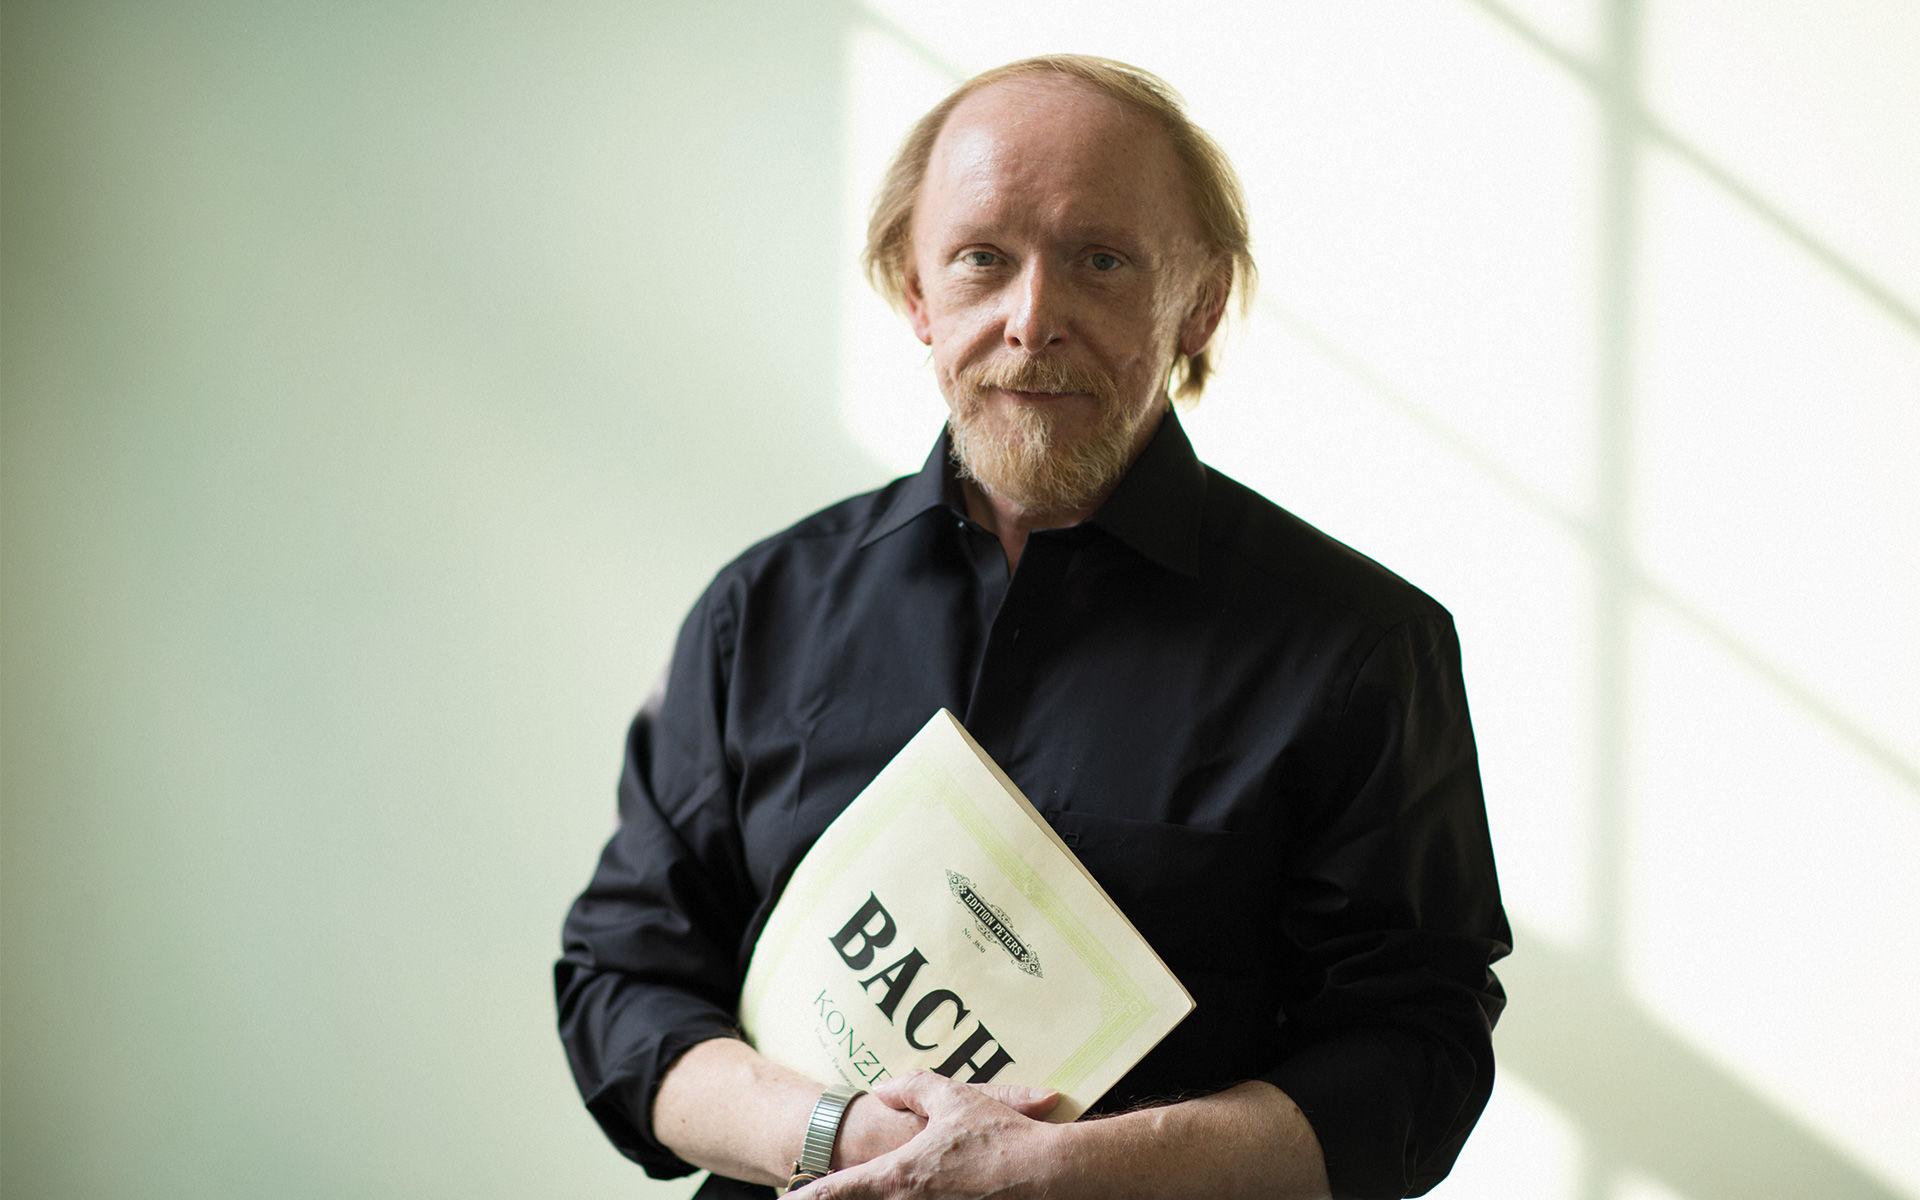 Mitglied der Staatsbad Philharmonie Kissingen, Christoph Staschowsky